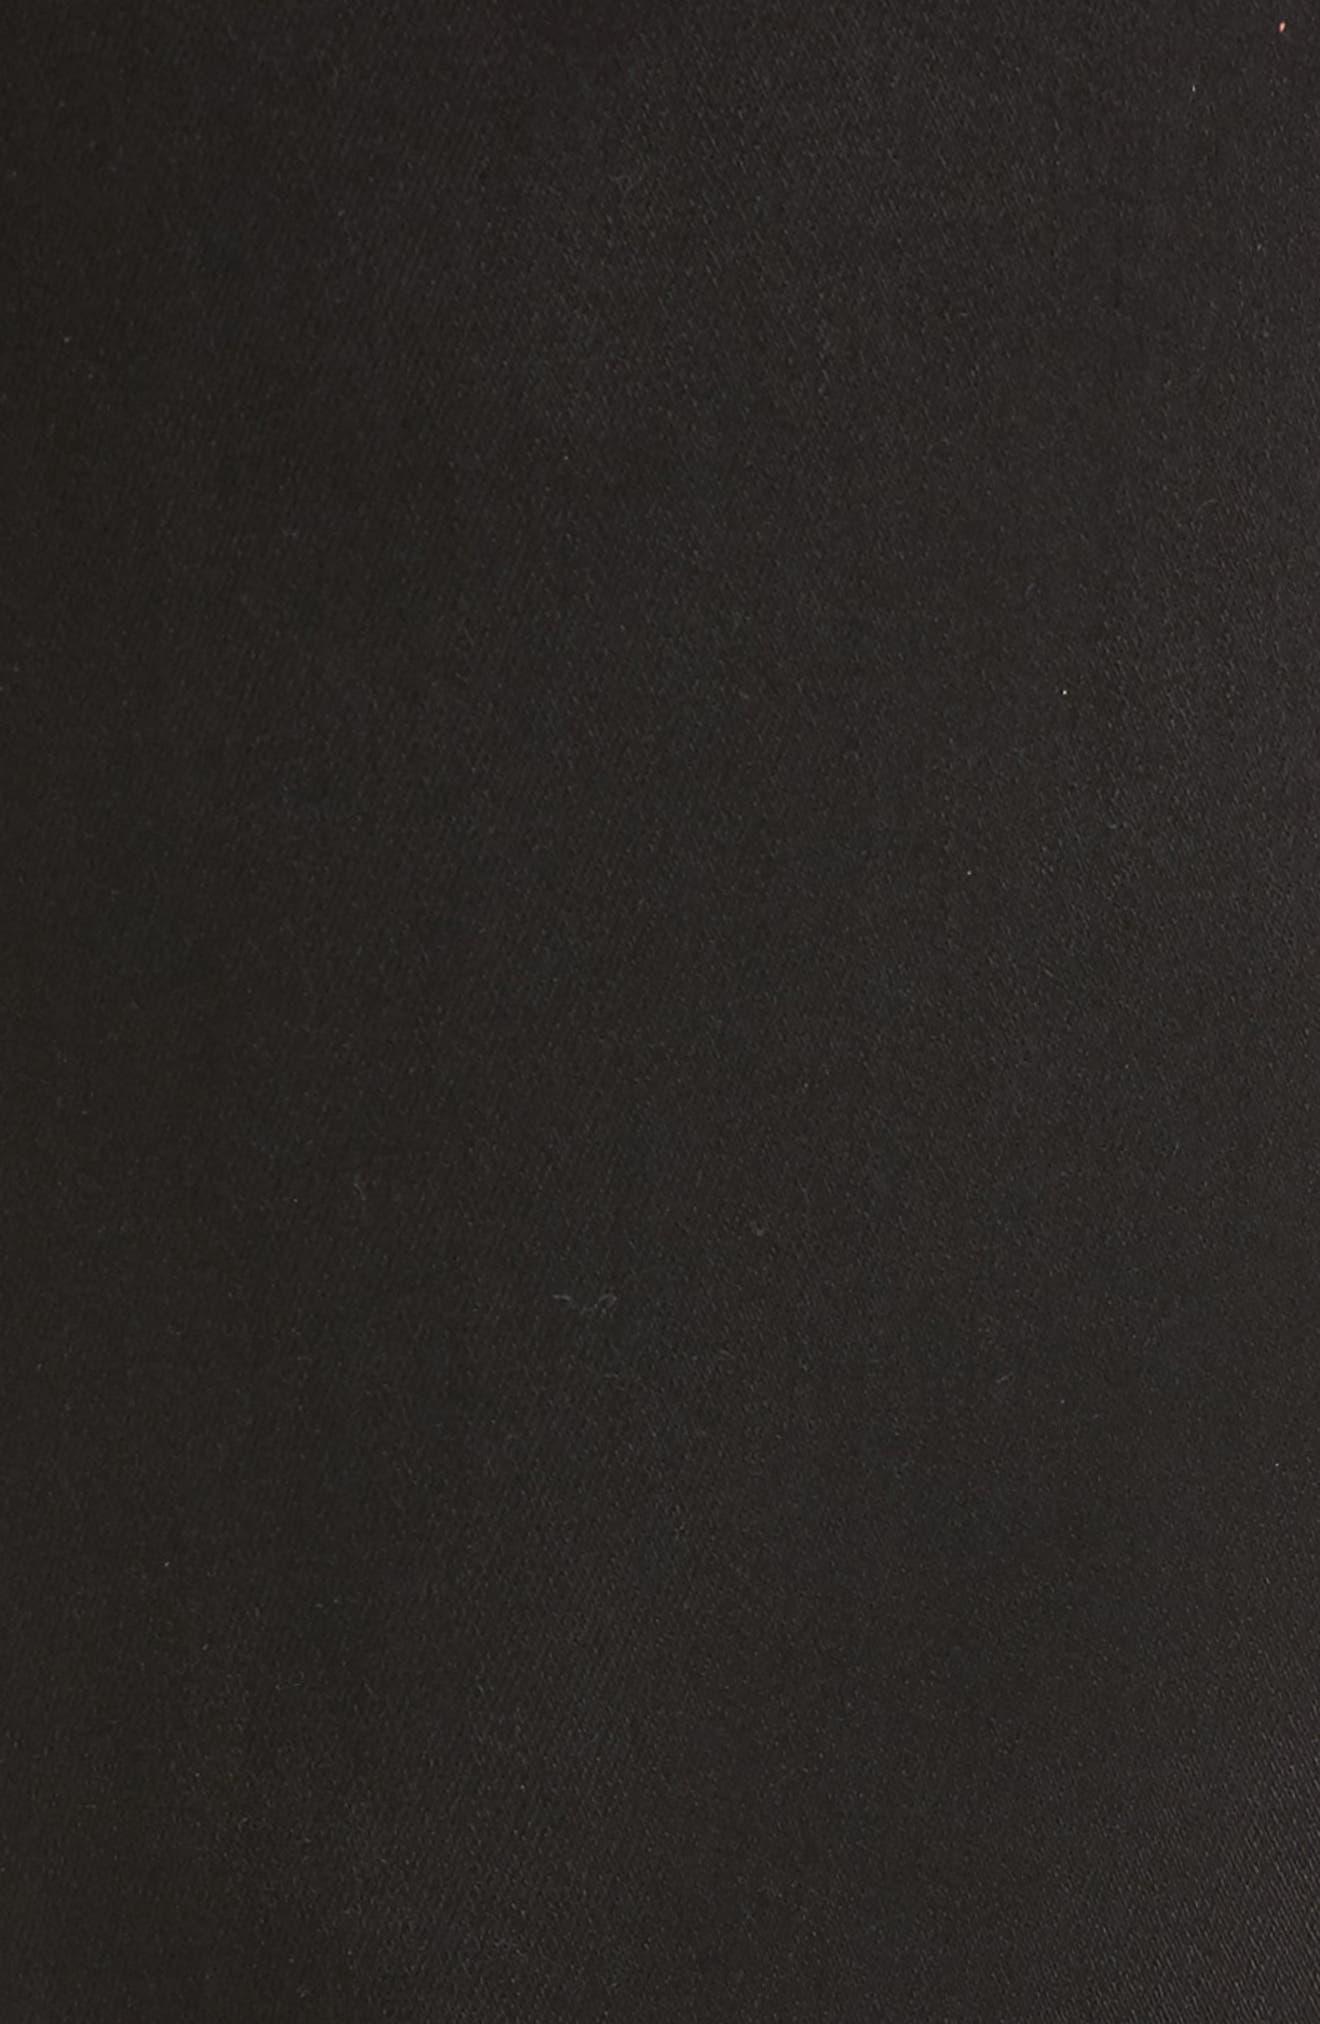 Torino Slim Fit Jeans,                             Alternate thumbnail 5, color,                             Everblack